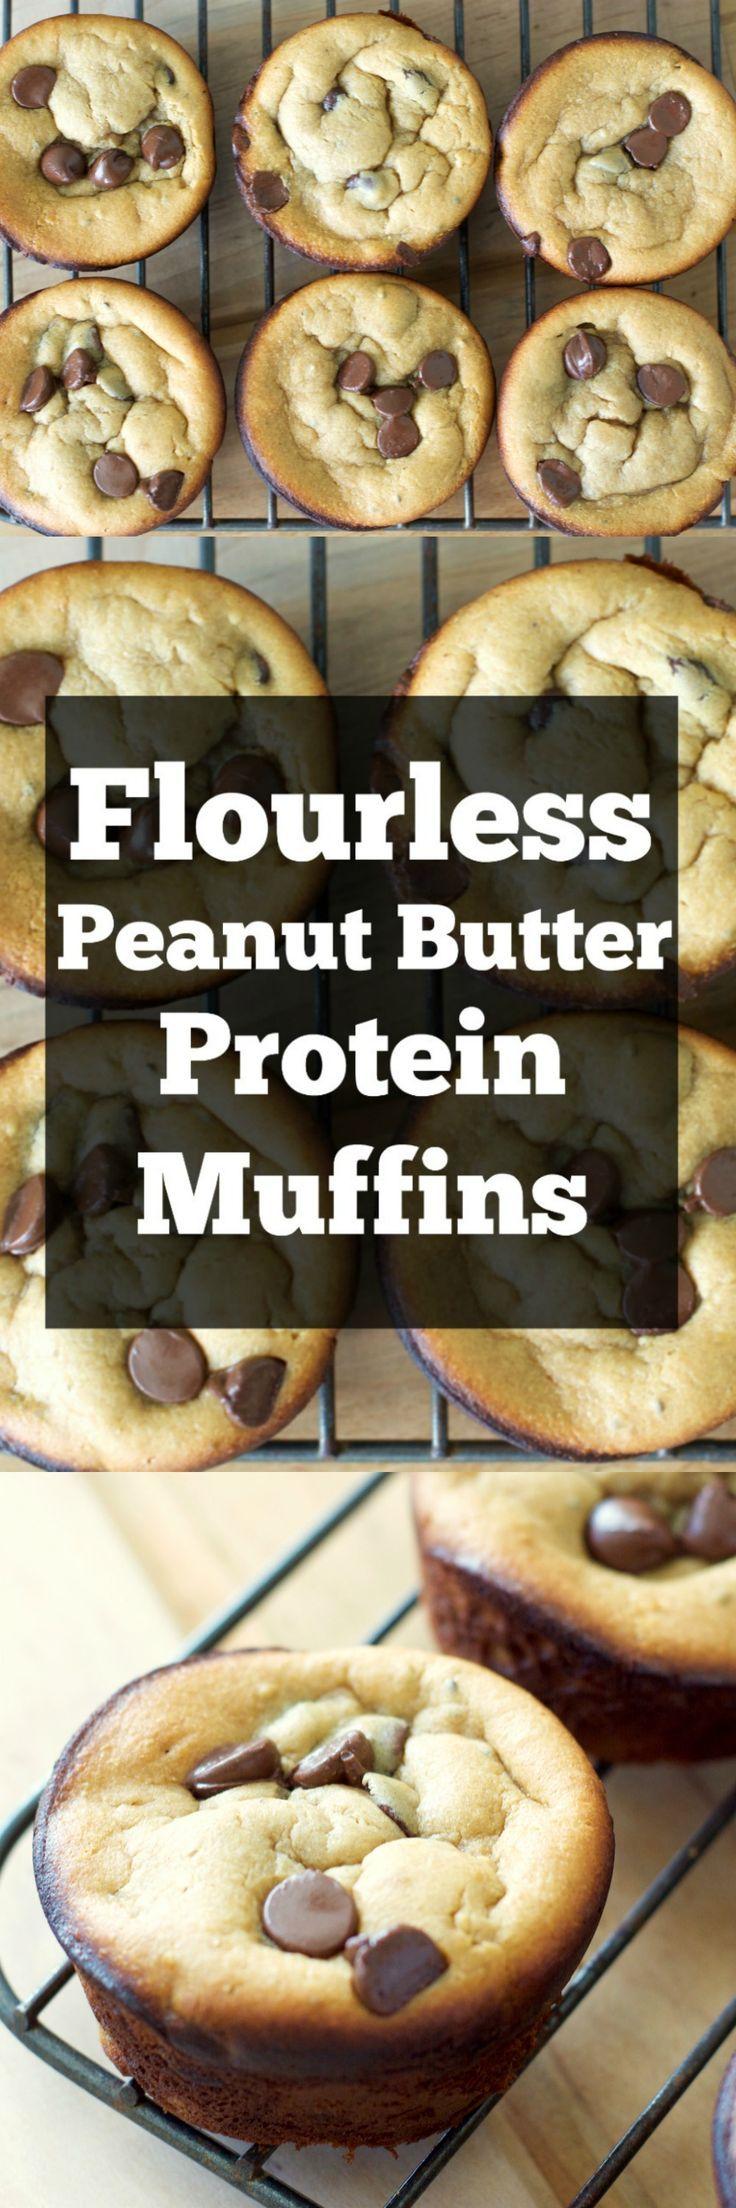 Peanut Butter Banana Protein Muffins | Bloggers' Best Healthy Recipes | Pinterest | Banana ...